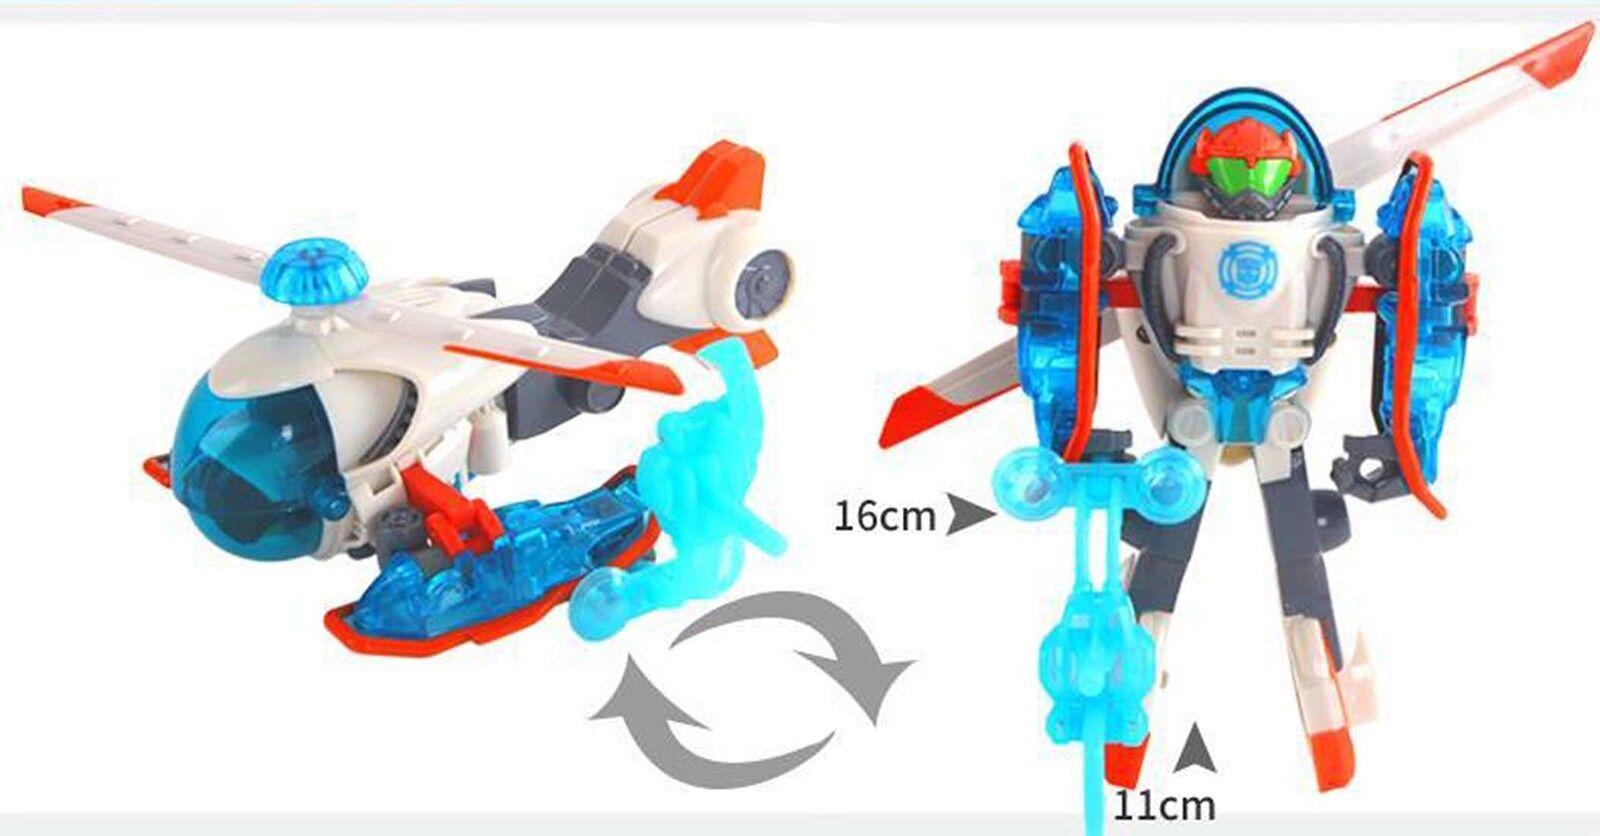 Transformers Playskool Heroes Heroes Heroes Rescue Bots BLADES THE CPTER-BOT Gift Christmas b0bcd8